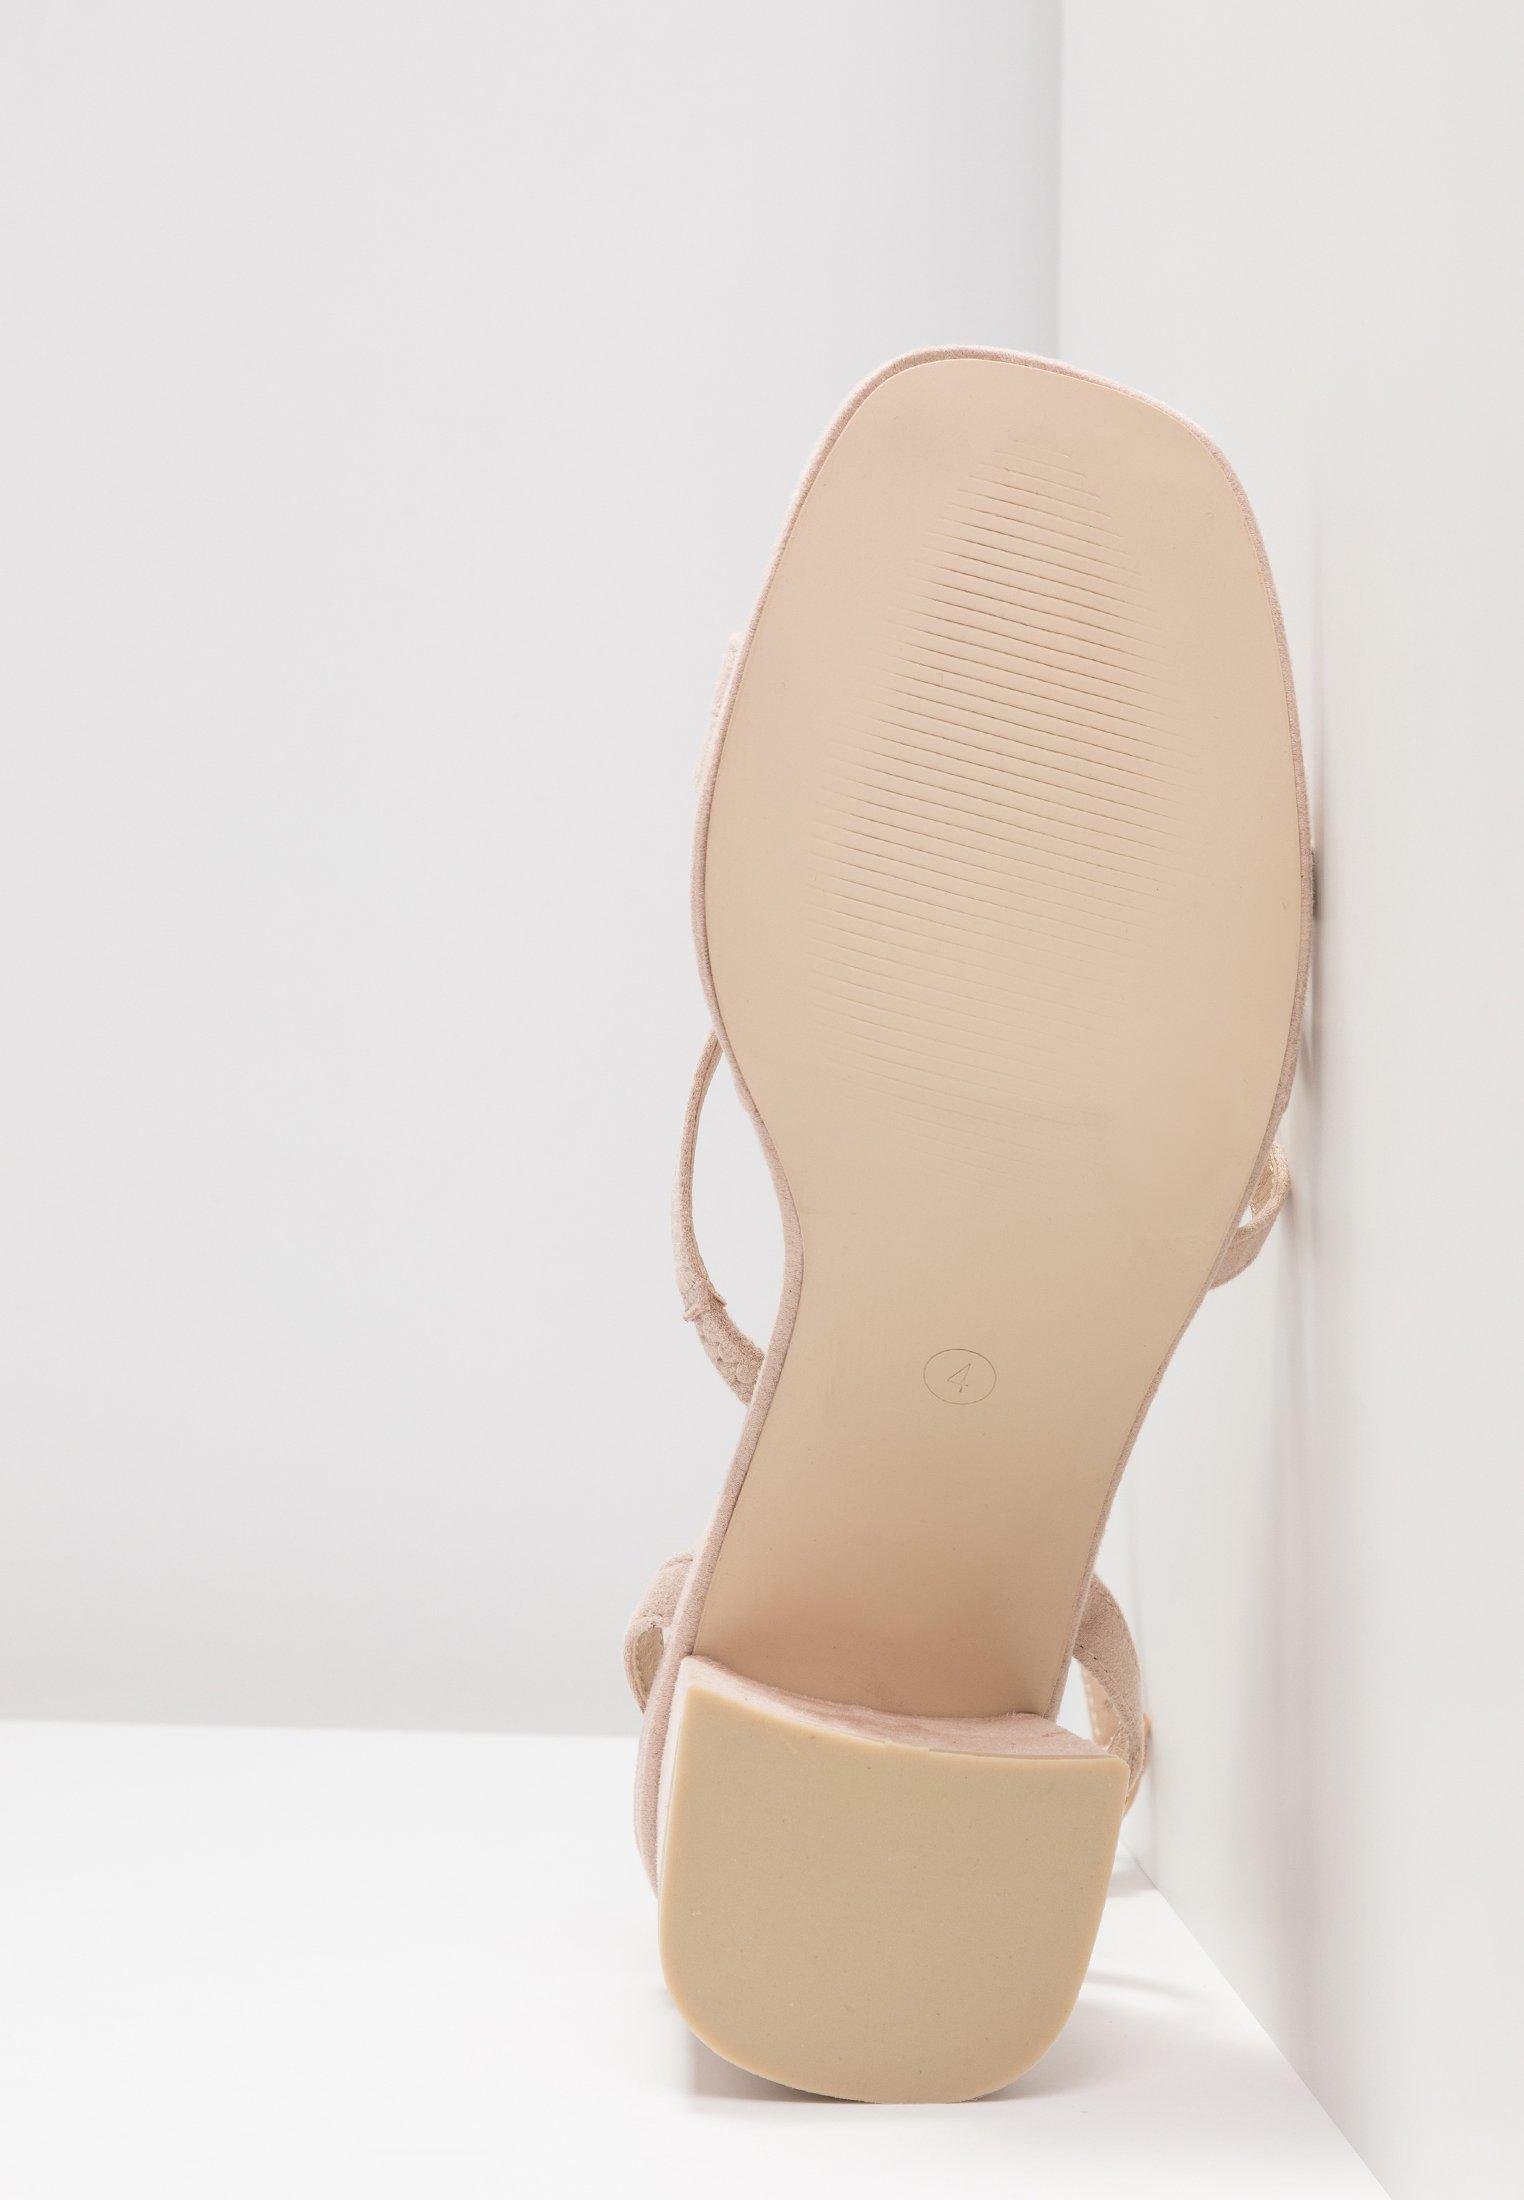 Bebo Clarity - Sandales À Talons Hauts Nude